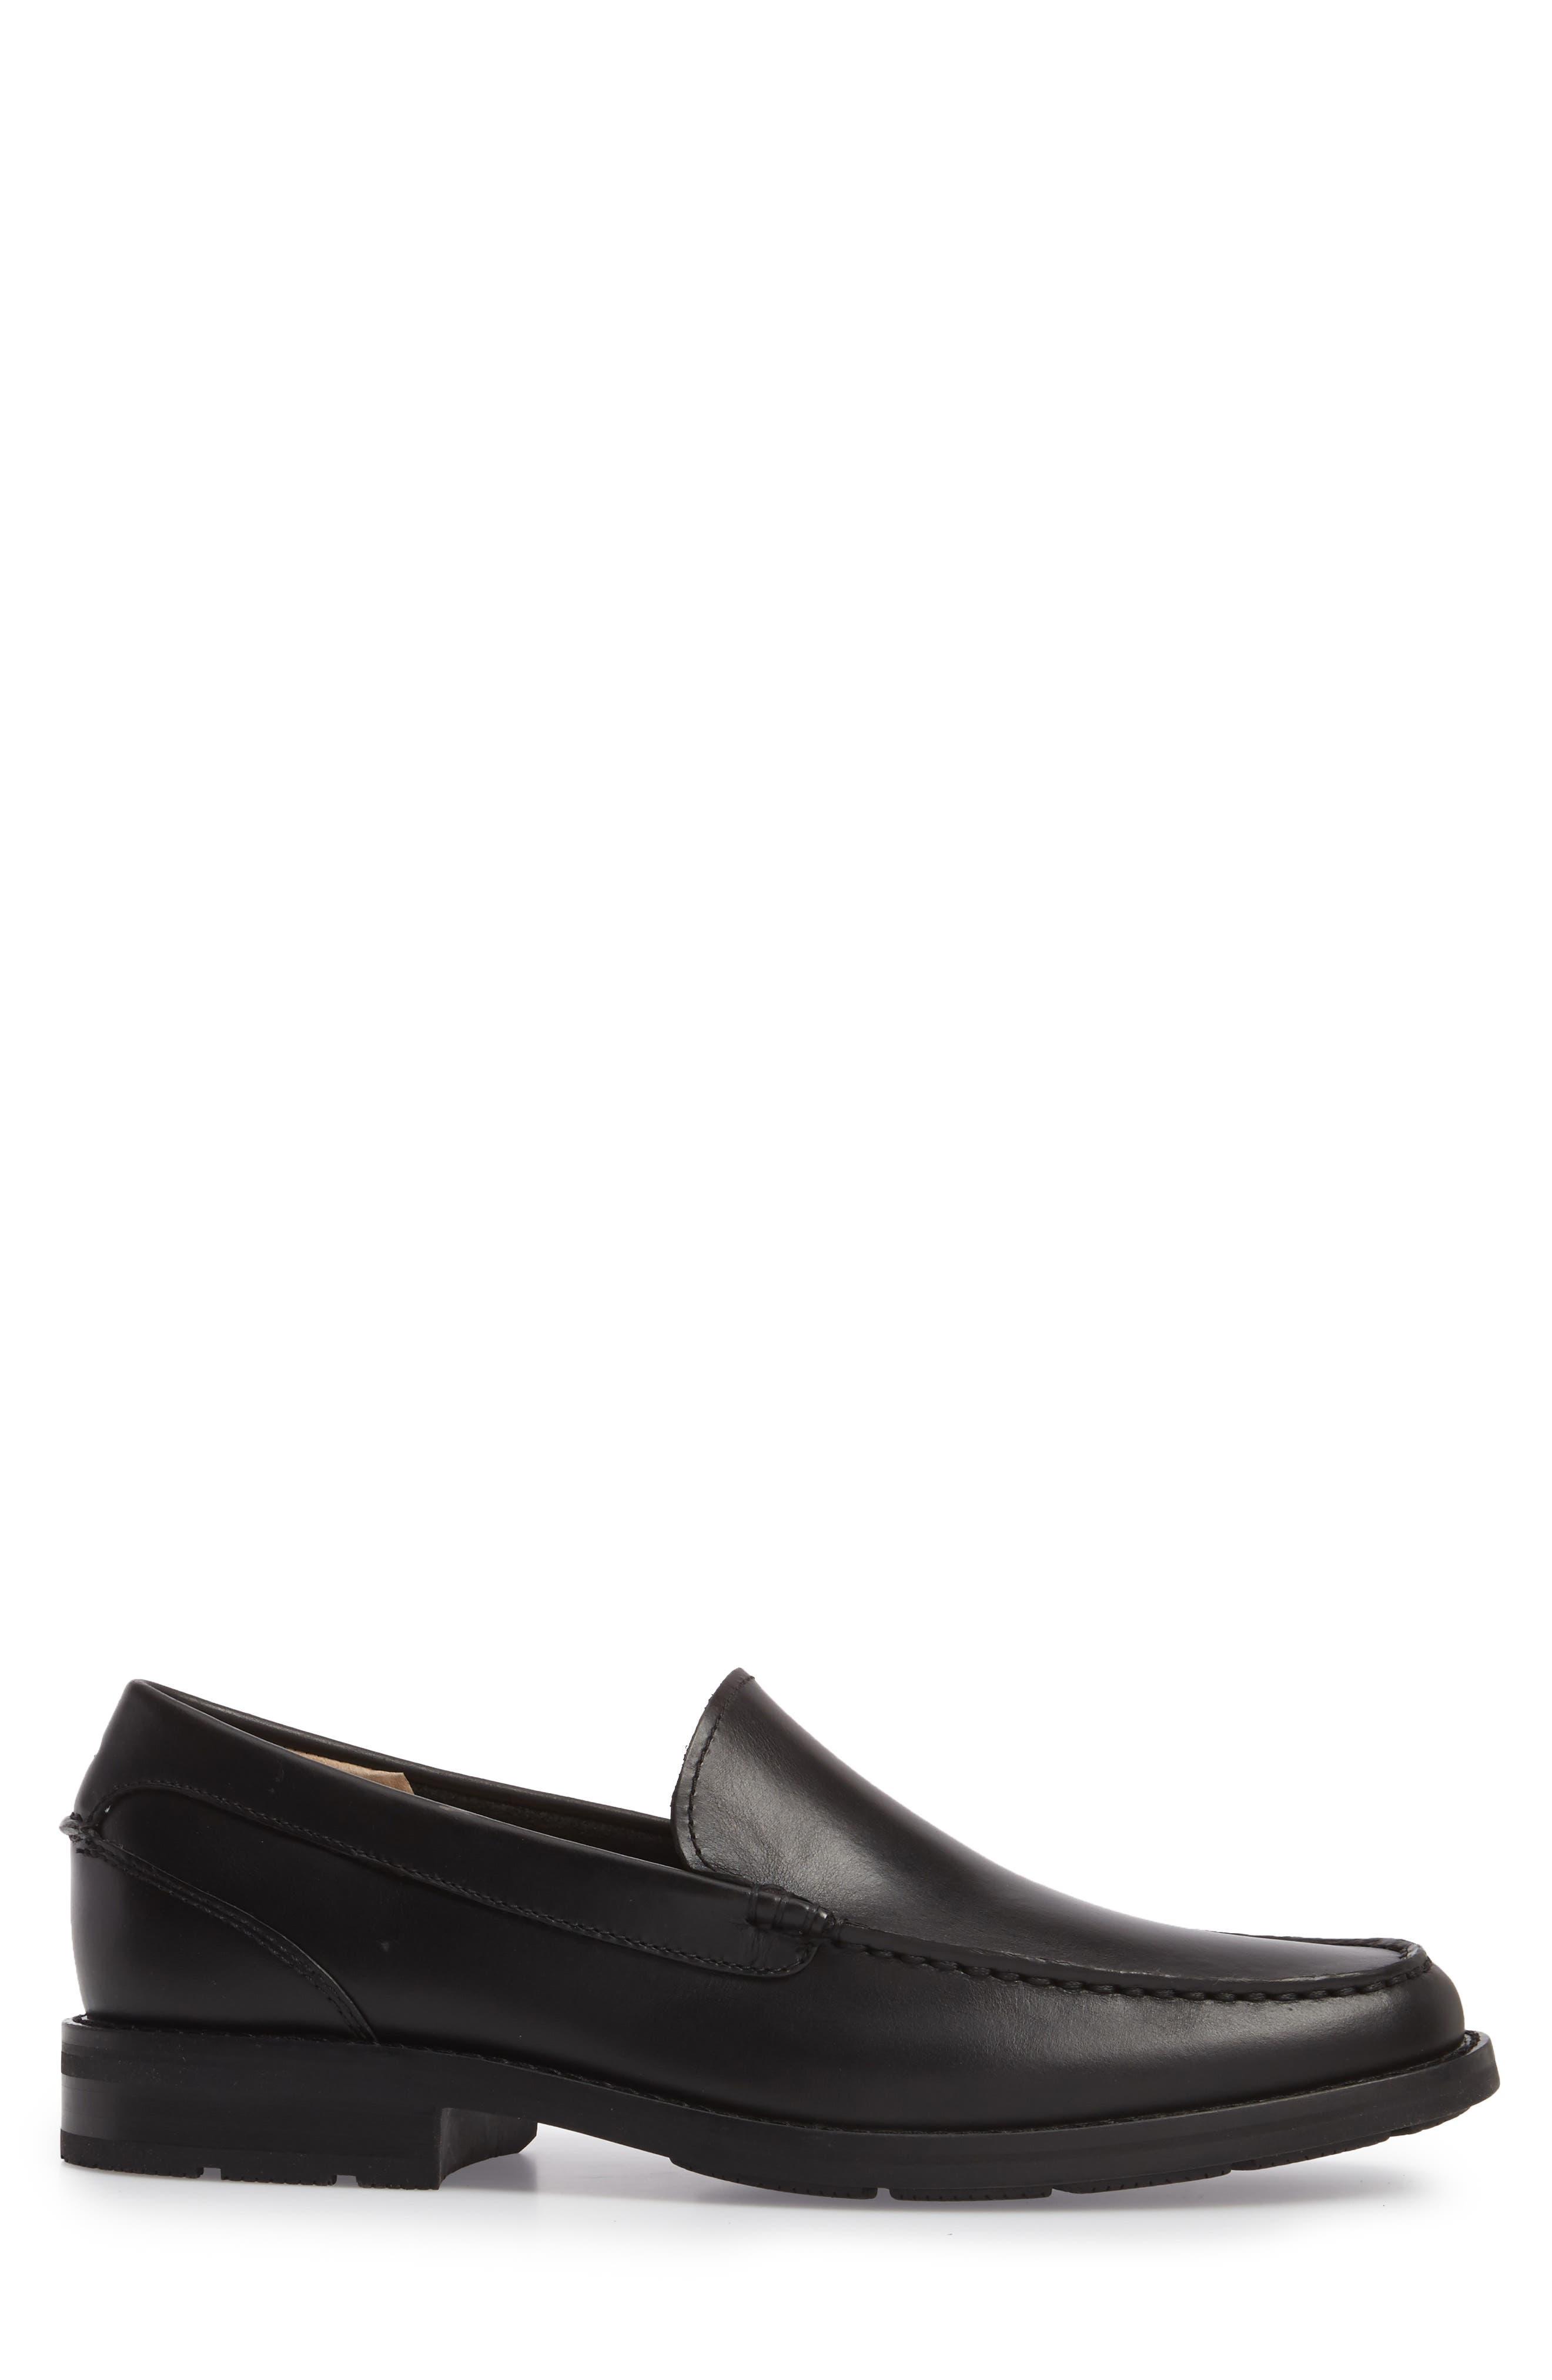 Essex Venetian Loafer,                             Alternate thumbnail 3, color,                             BLACK LEATHER